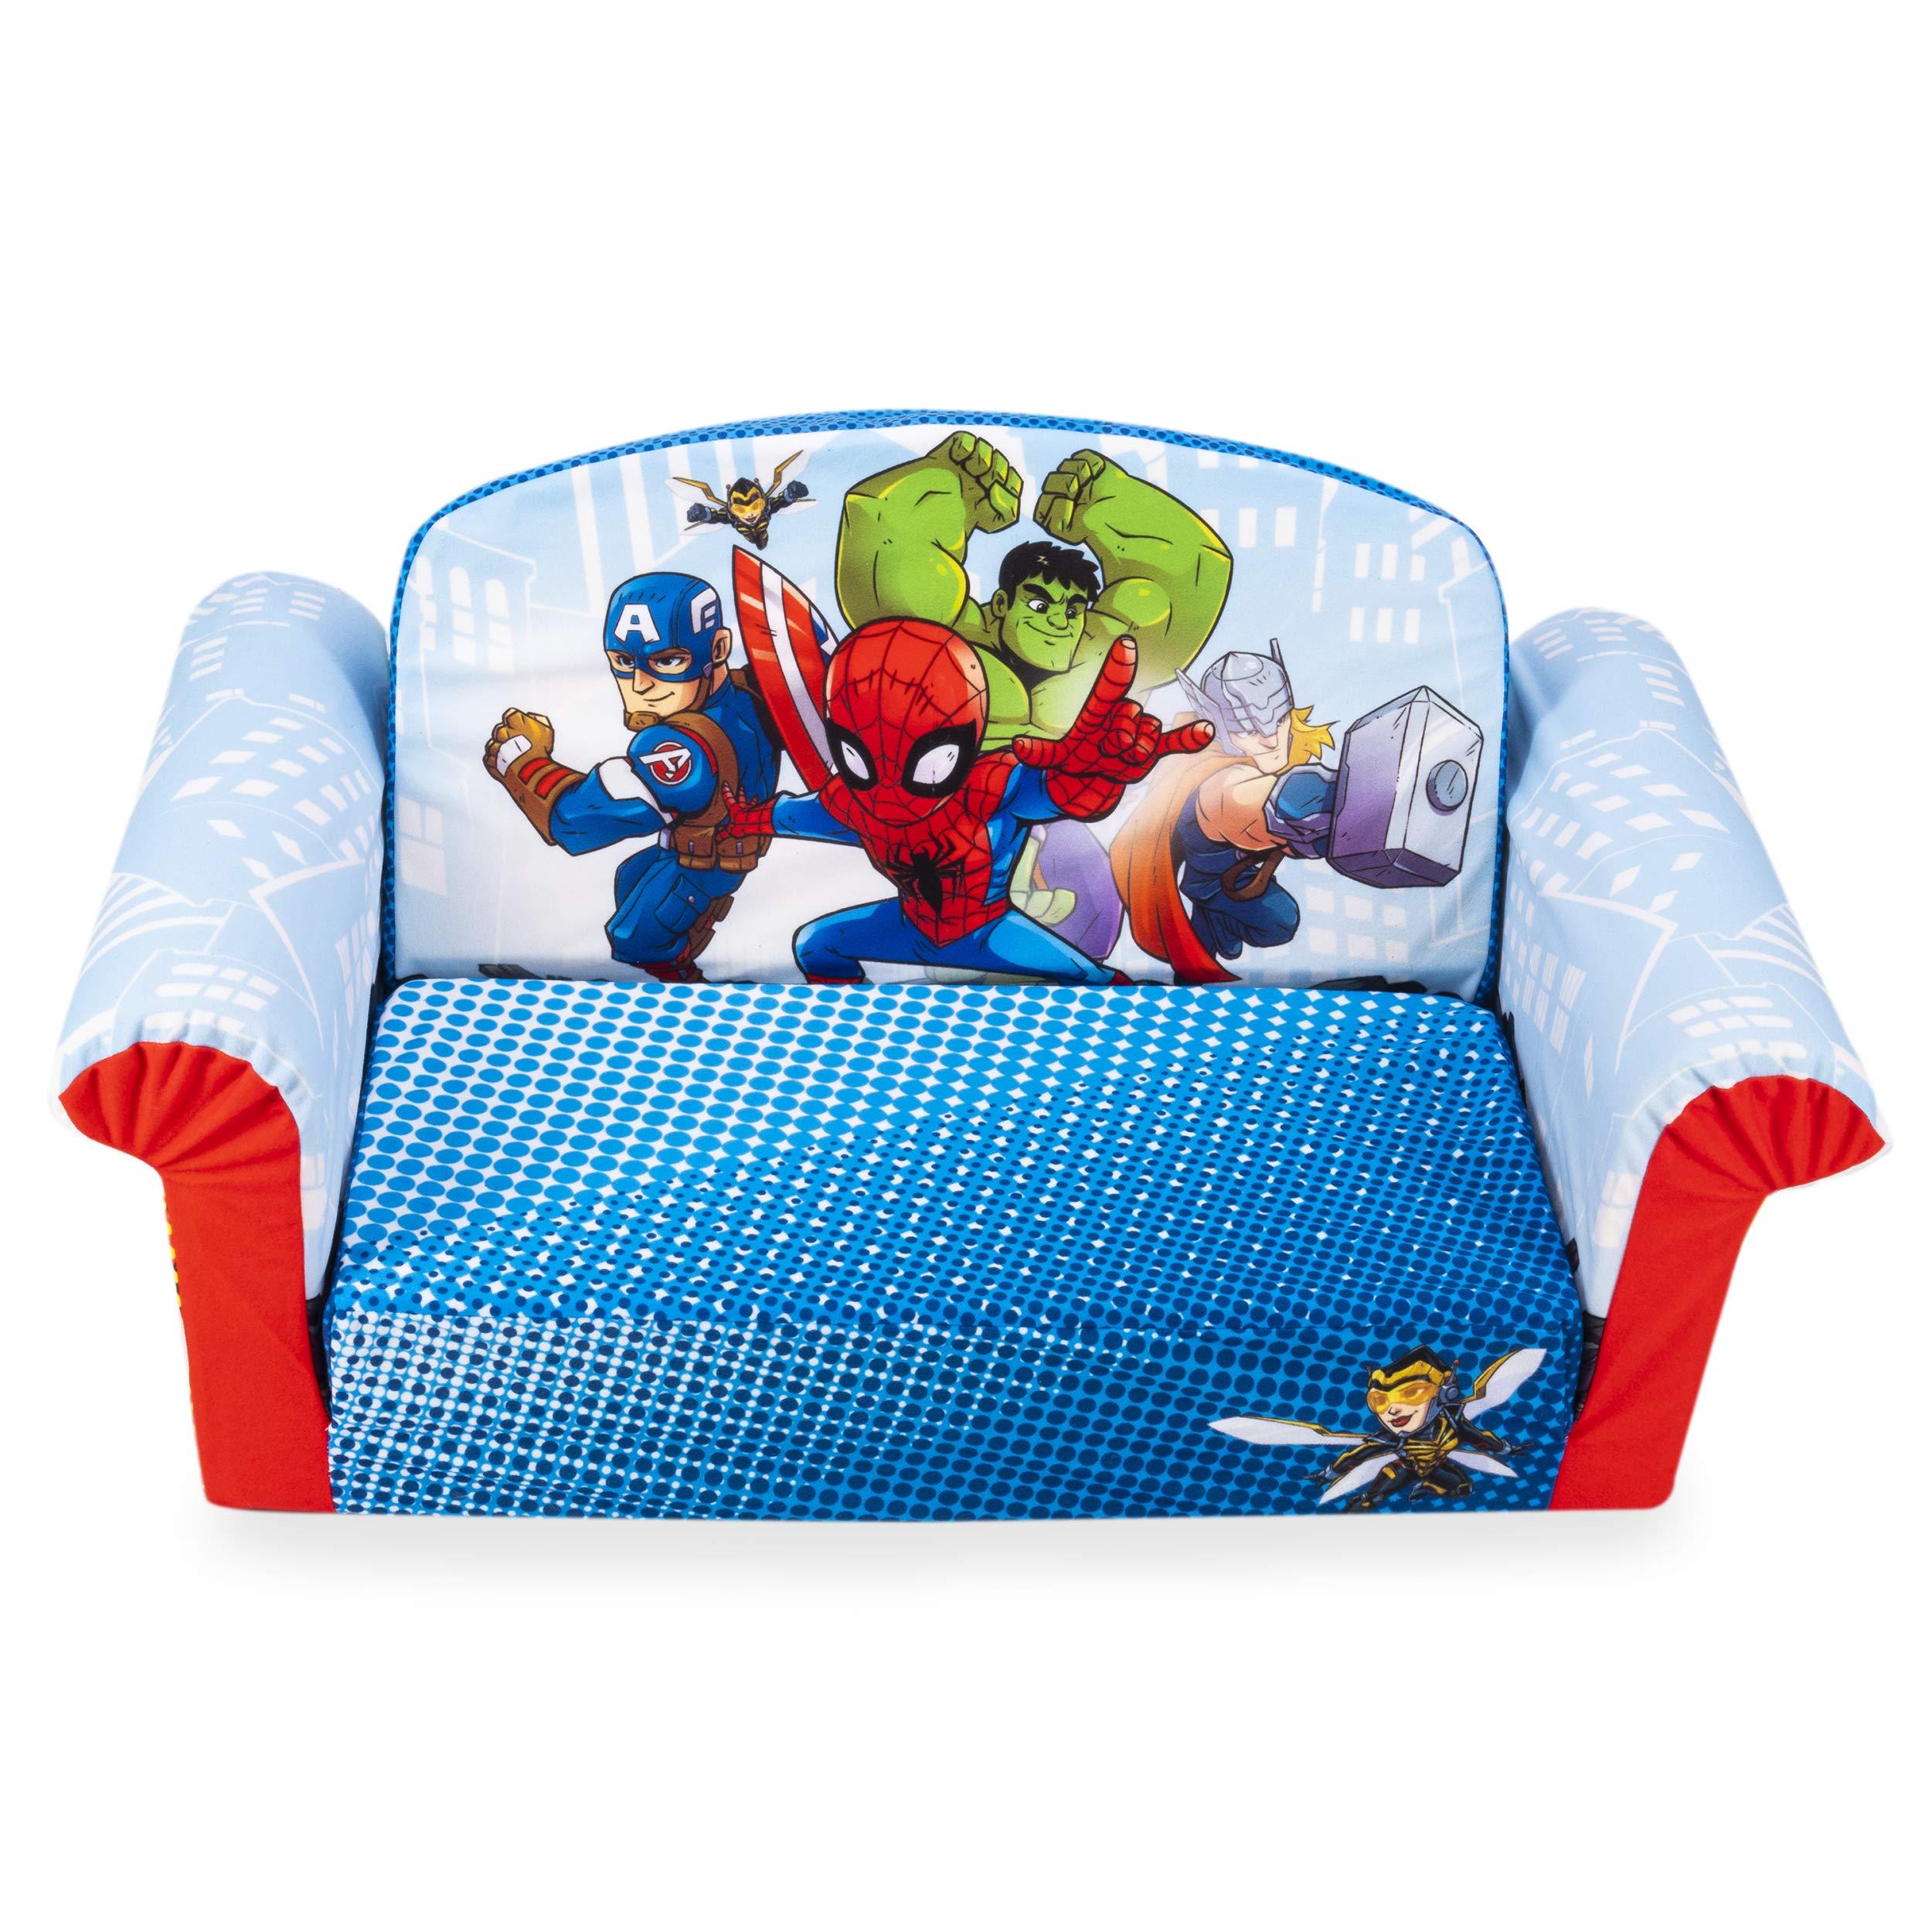 Marshmallow Furniture, Children's 2-in-1 Flip Open Foam Sofa, Marvel Super Hero Adventures, by Spin Master by Marshmallow Furniture